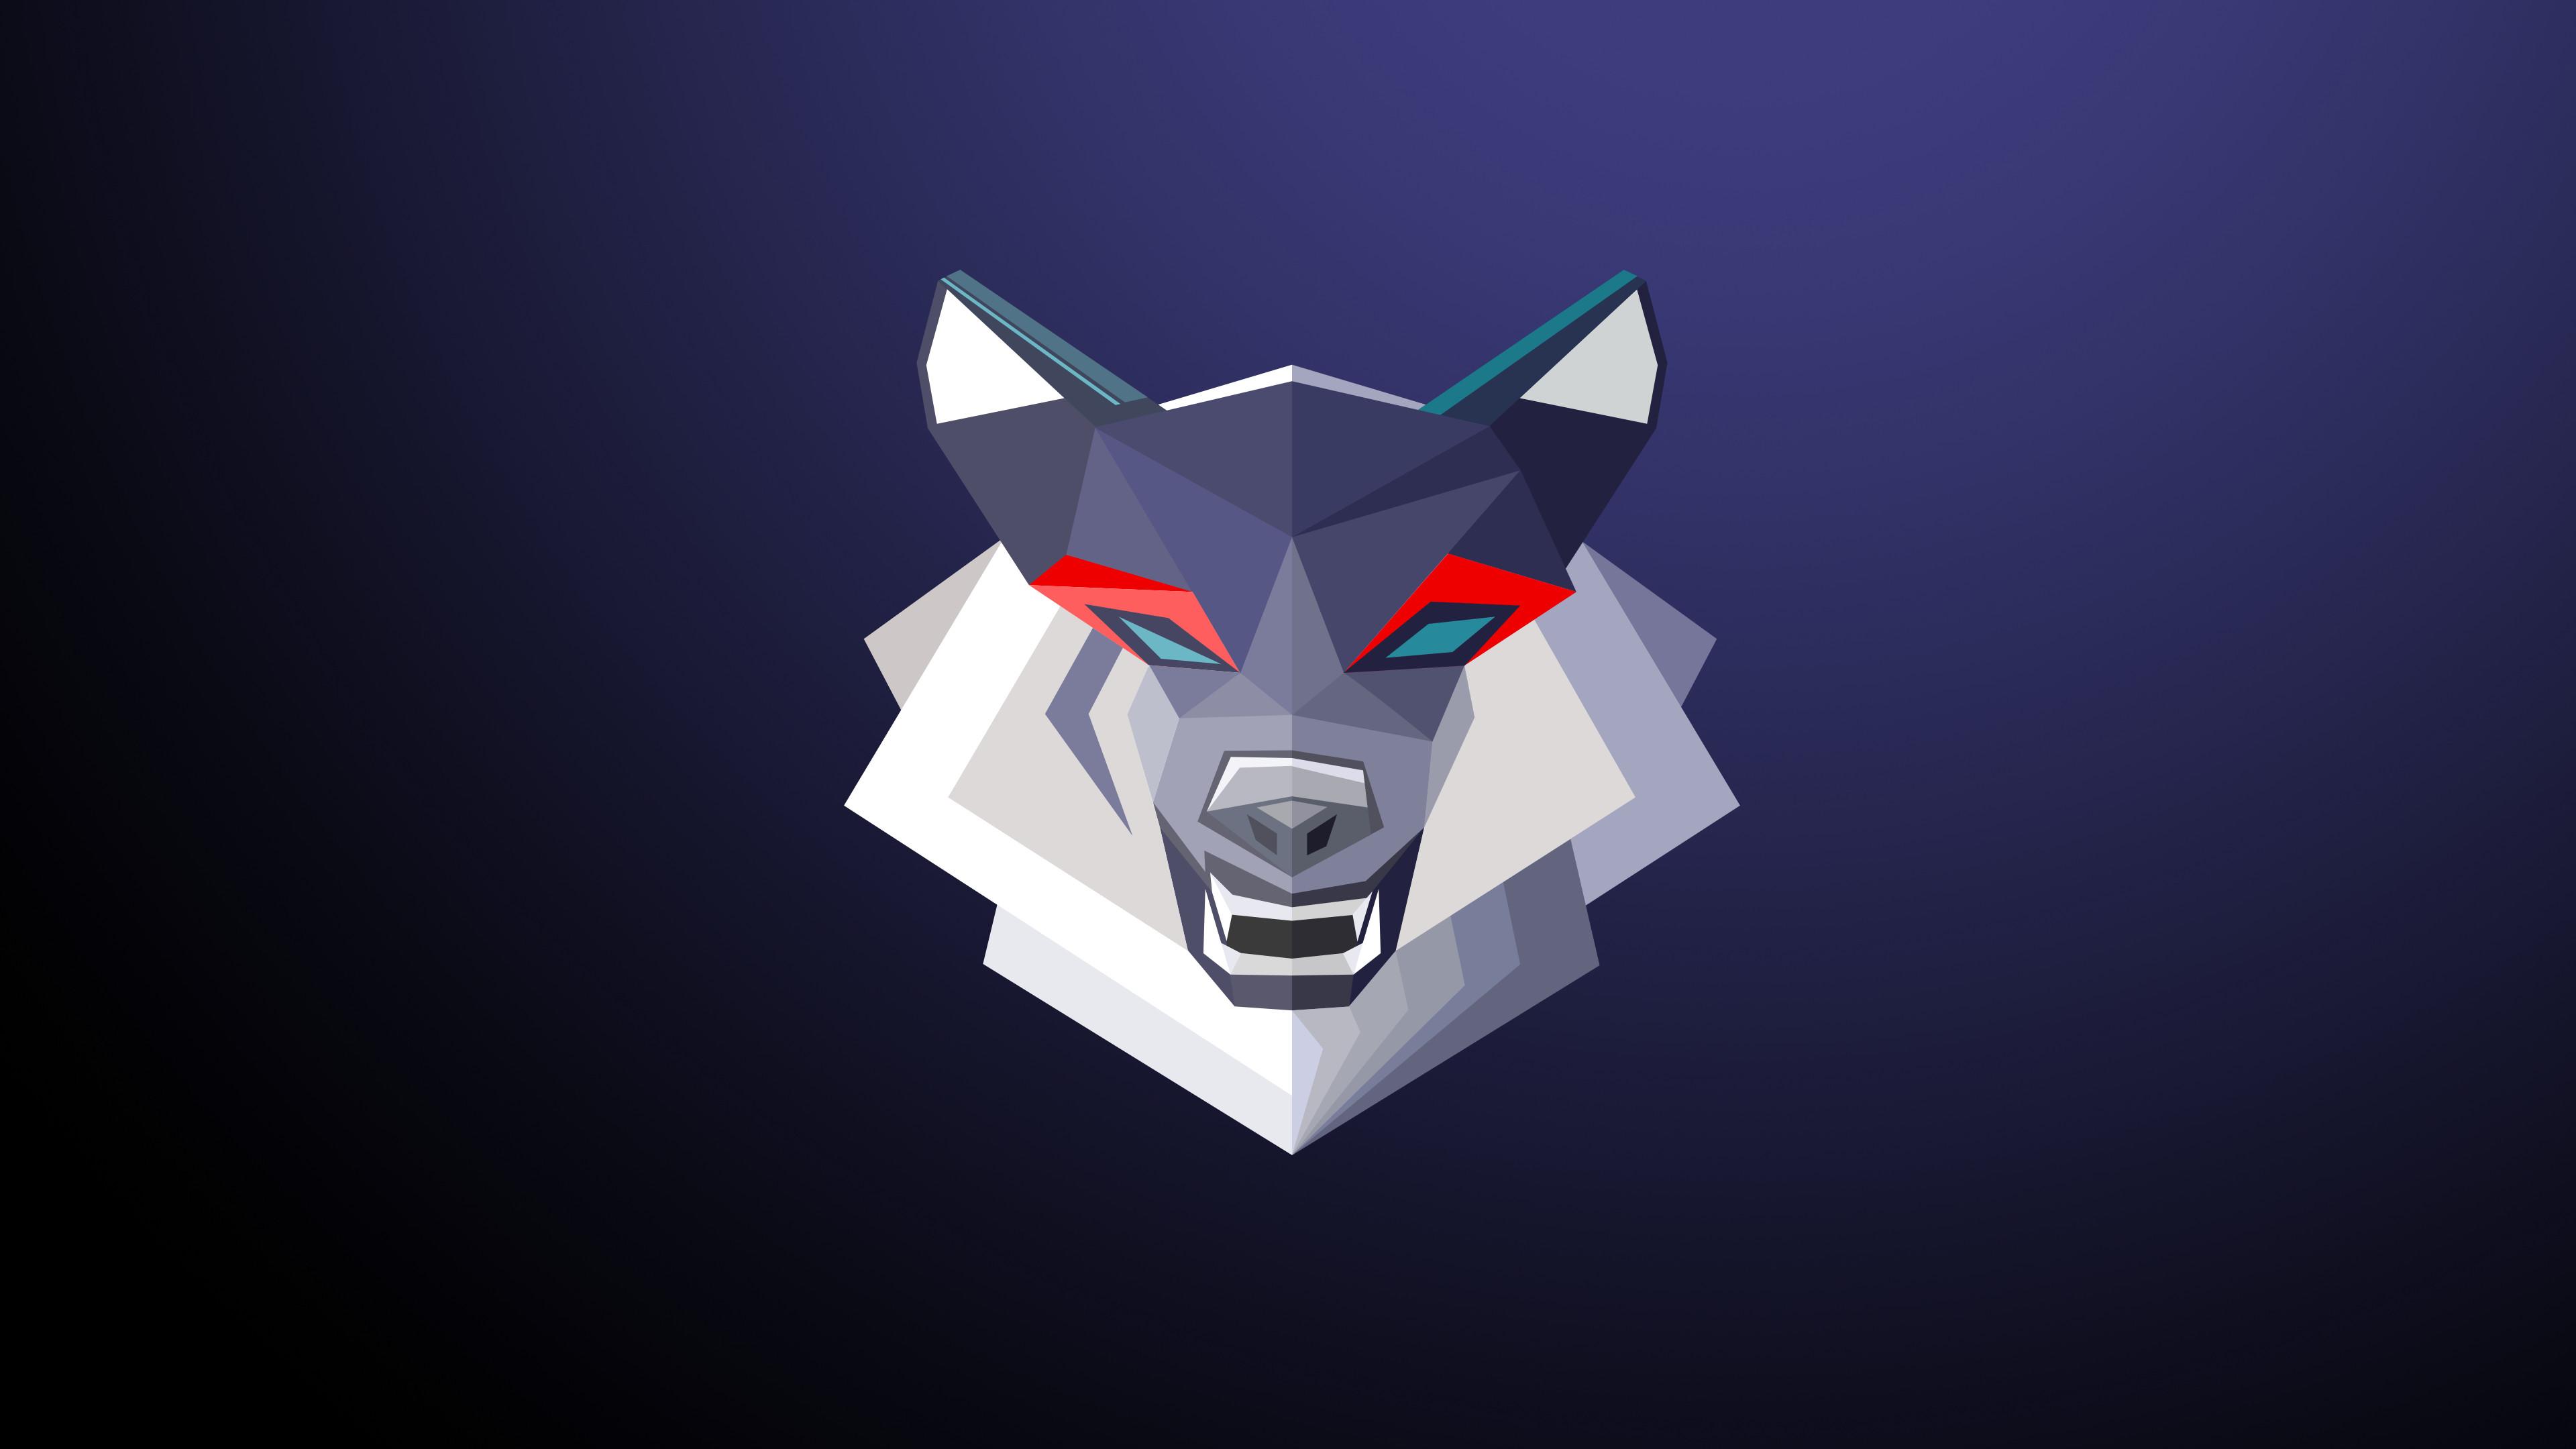 abstract, Wolf, Digital art, Animals Wallpaper